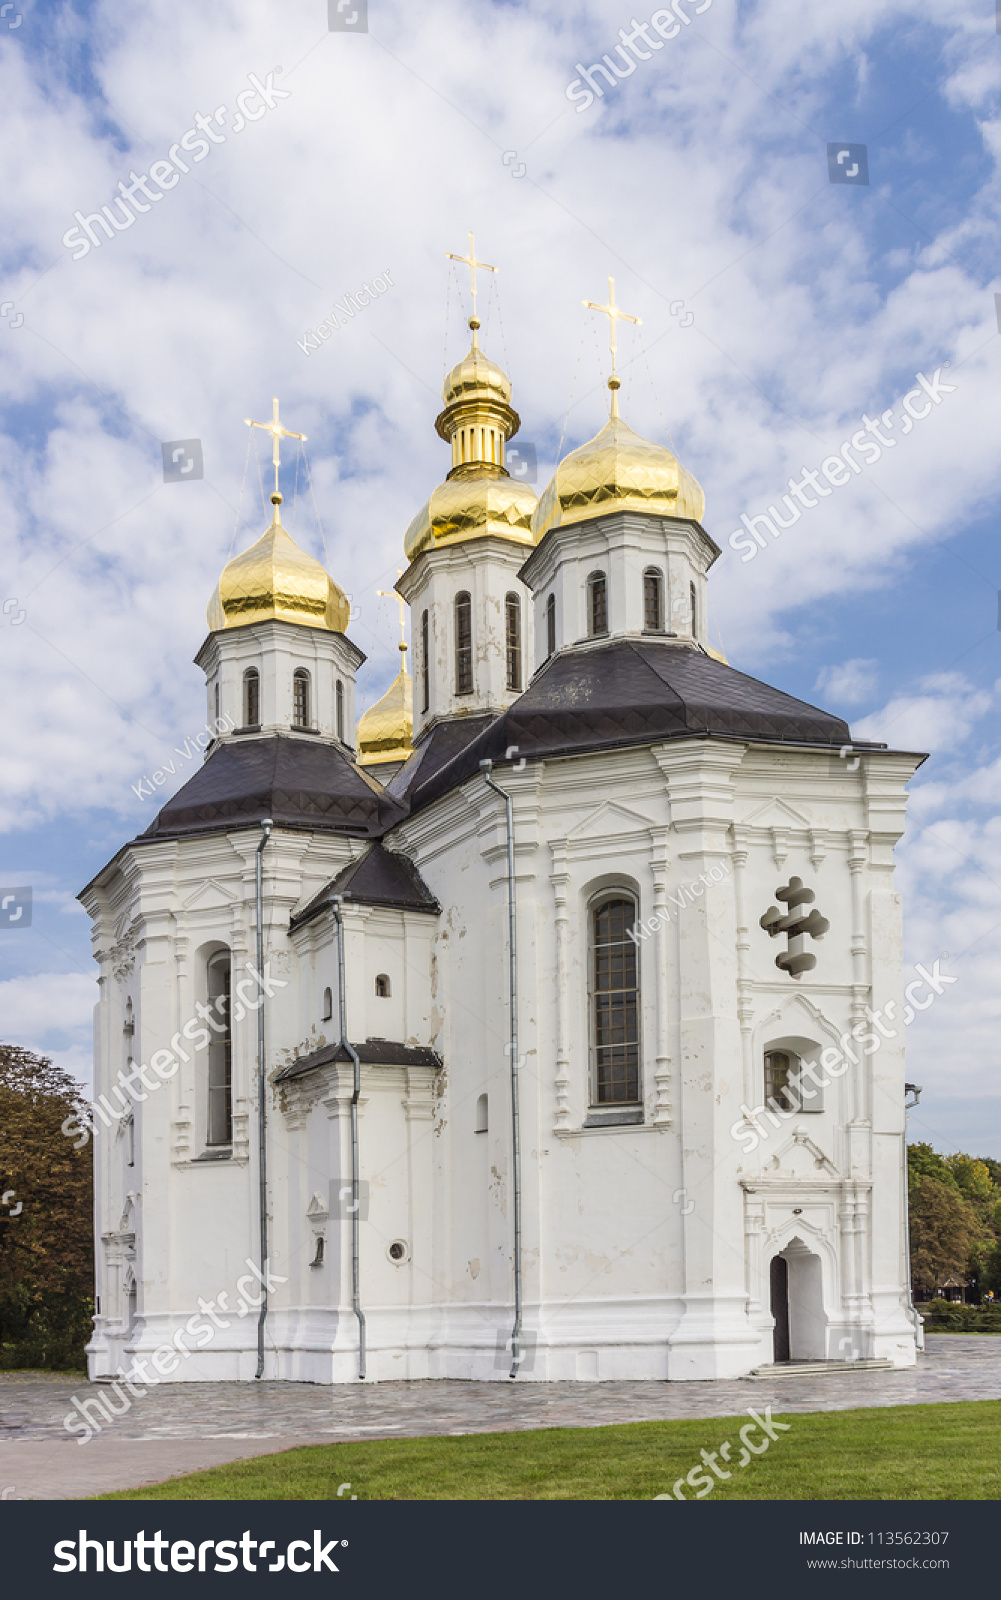 St. Ilyinsky Church - the first Orthodox church of Kievan Rus